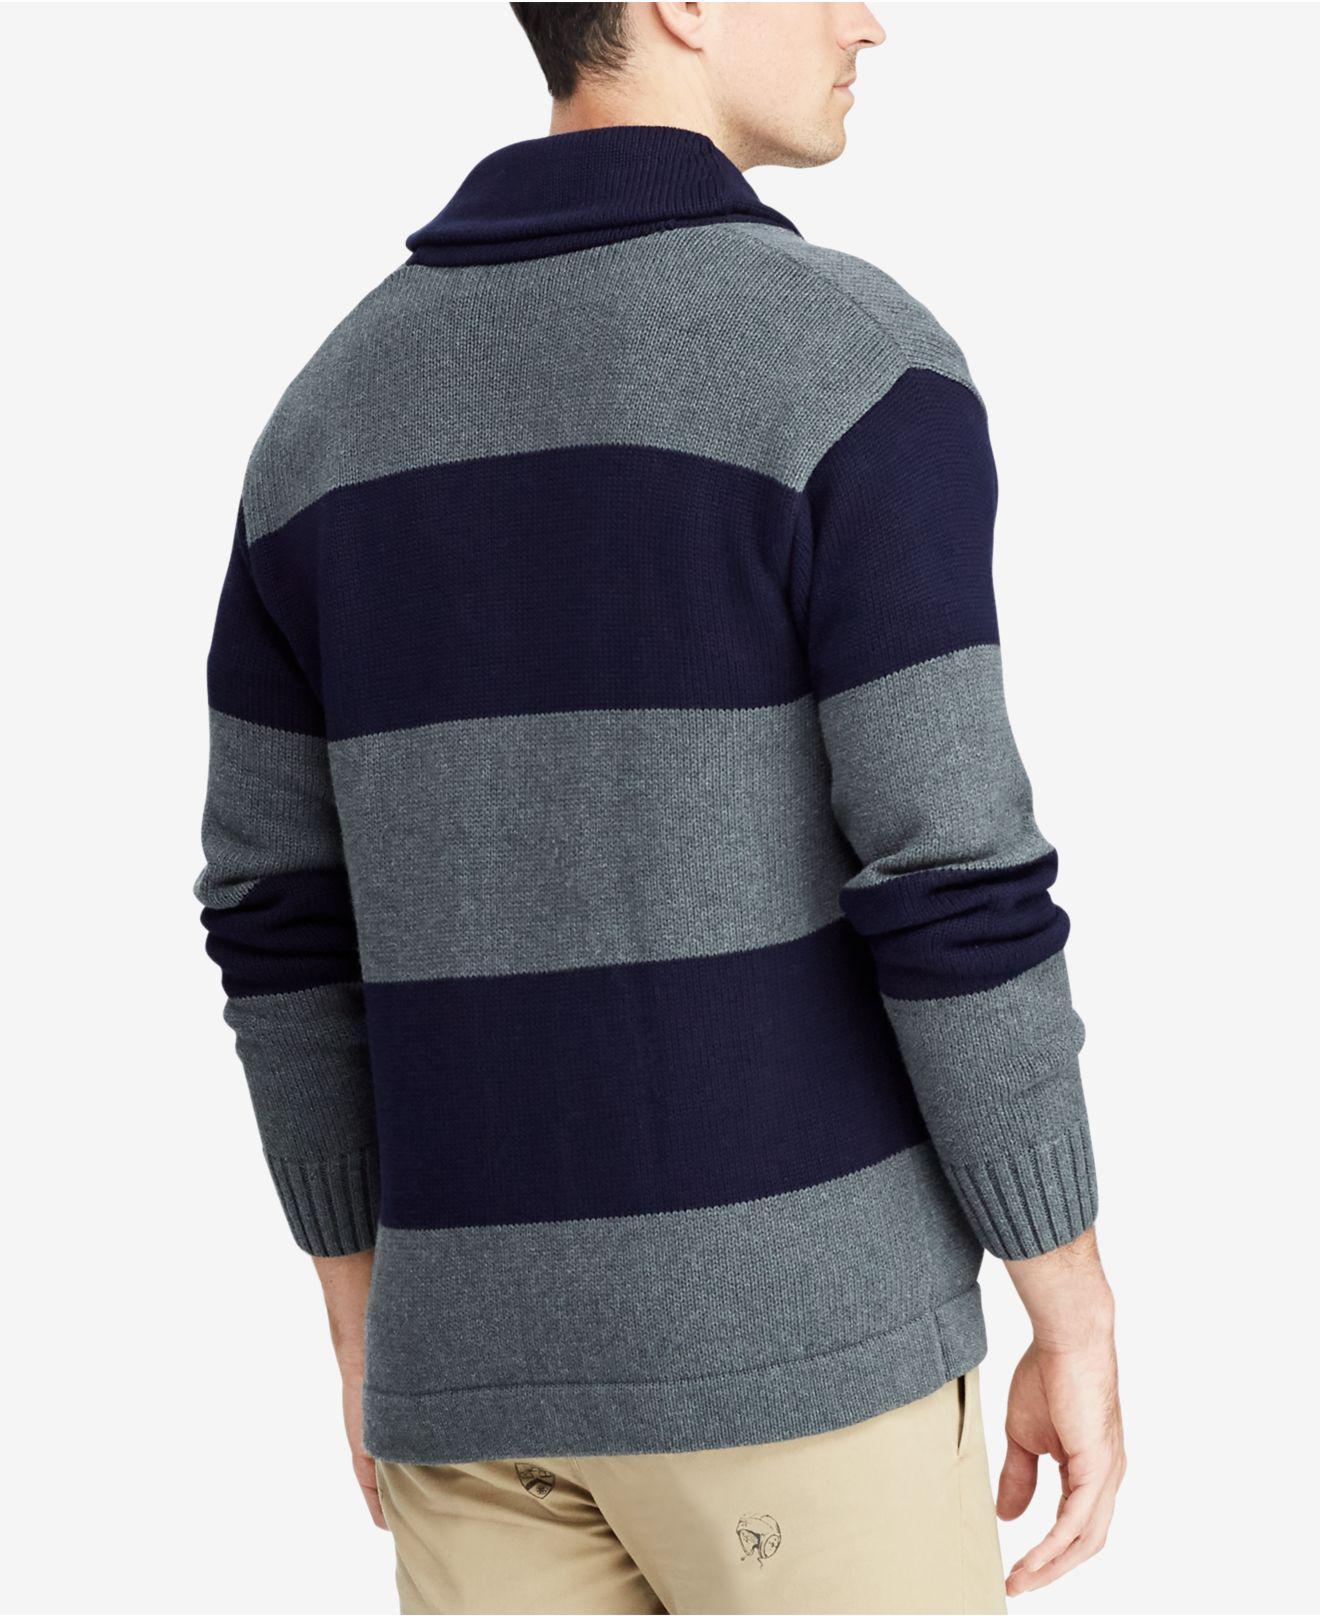 afc6ad3ac ... czech lyst polo ralph lauren shawl collar cardigan in blue for men  c4c56 d5cf5